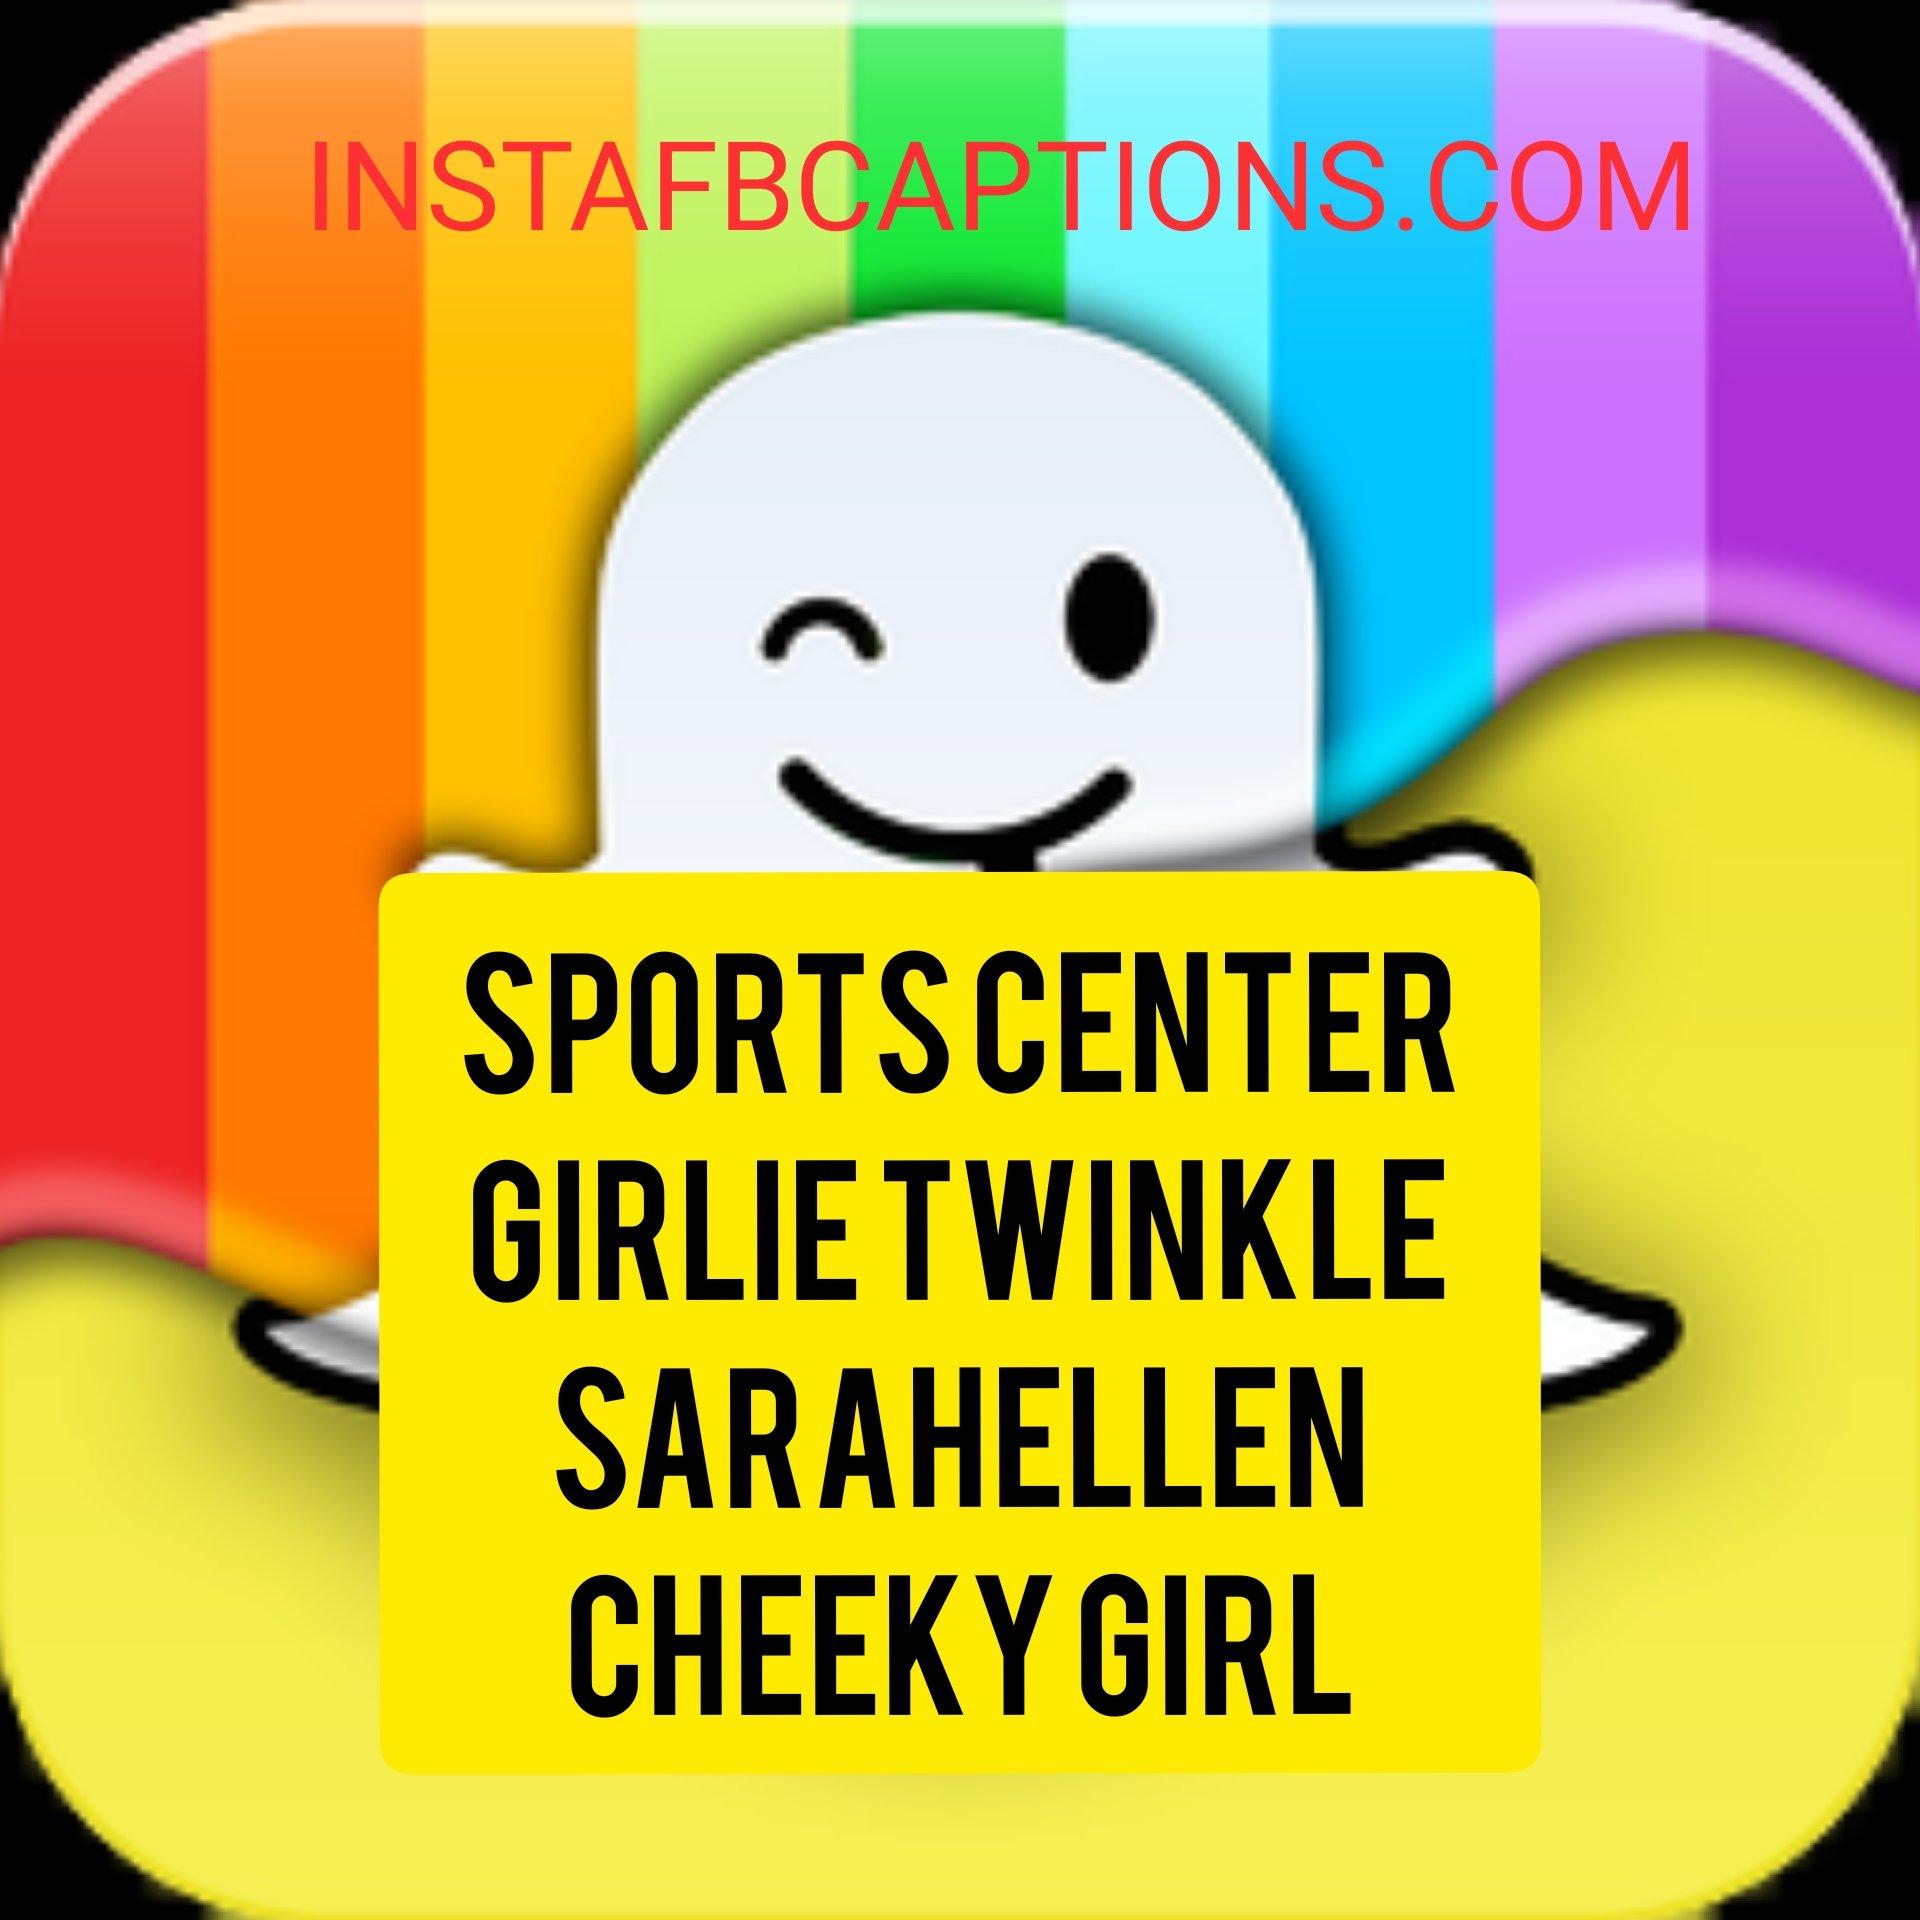 Names For Your Friends  - Names for your friends - 750+ Best SNAPCHAT NAME IDEAS for Guys & Girls 2021